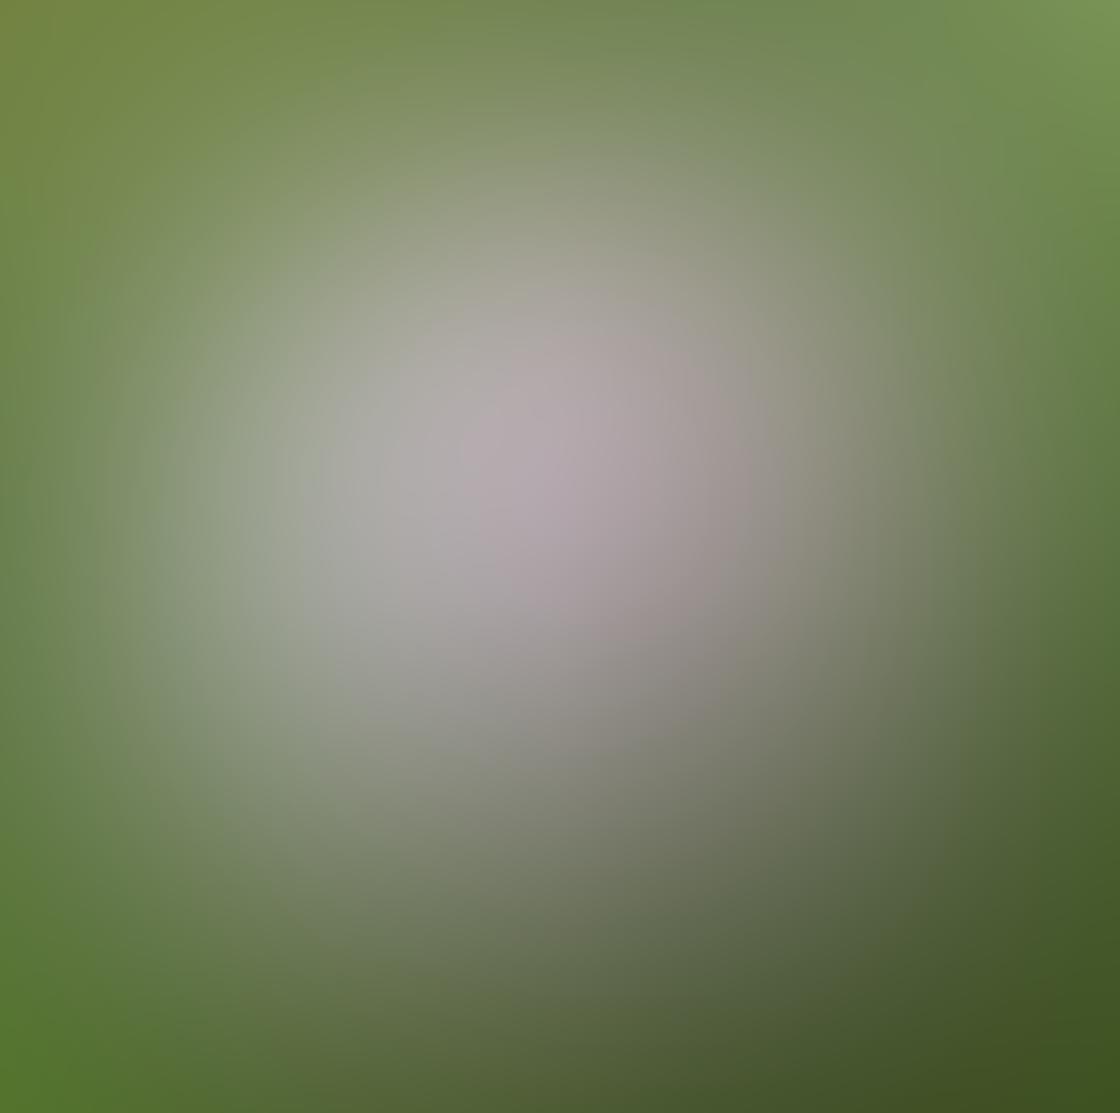 iPhone Ollocase Olloclip Active Lens 29